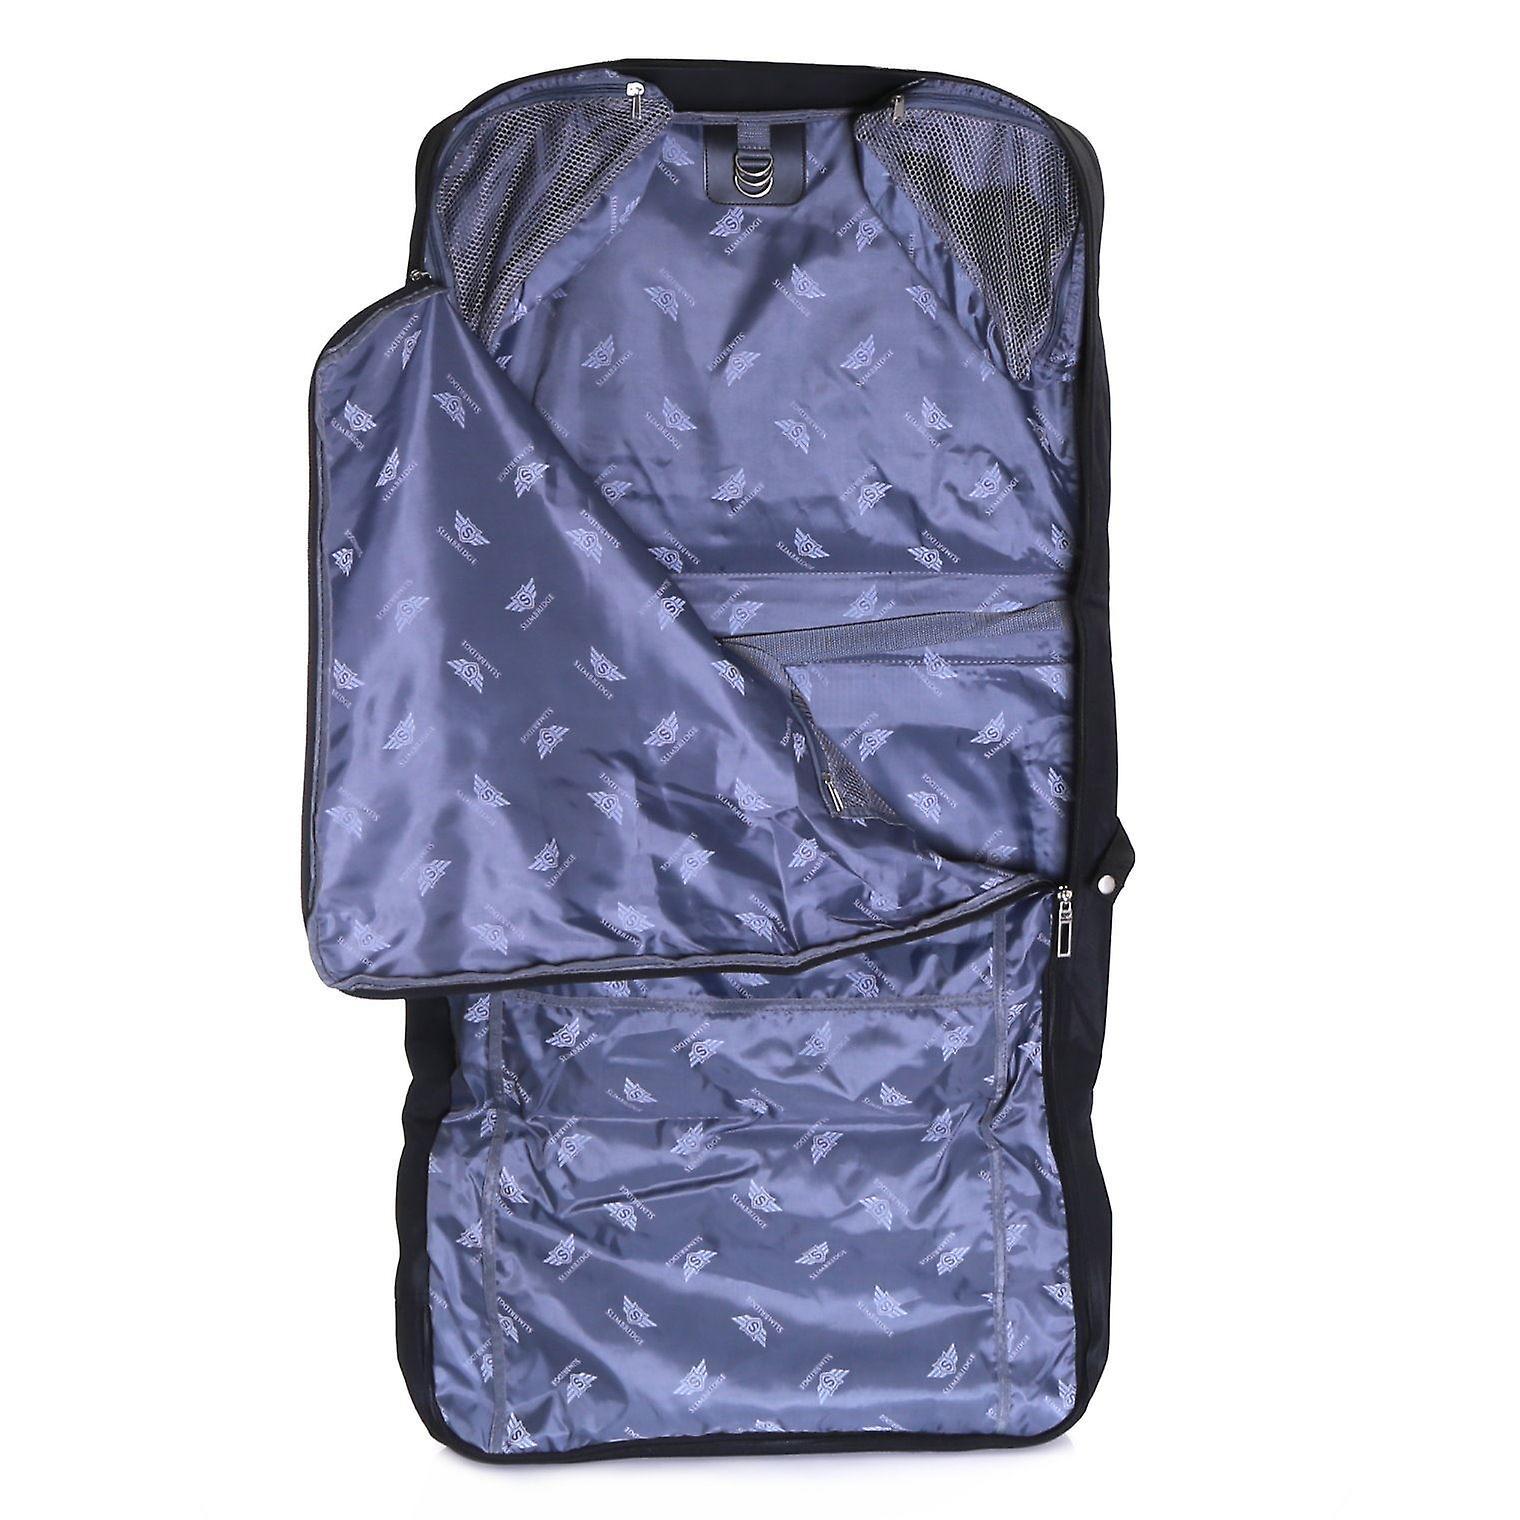 Slimbridge Rha Tri-Fold Cabin Suit Carrier, Black